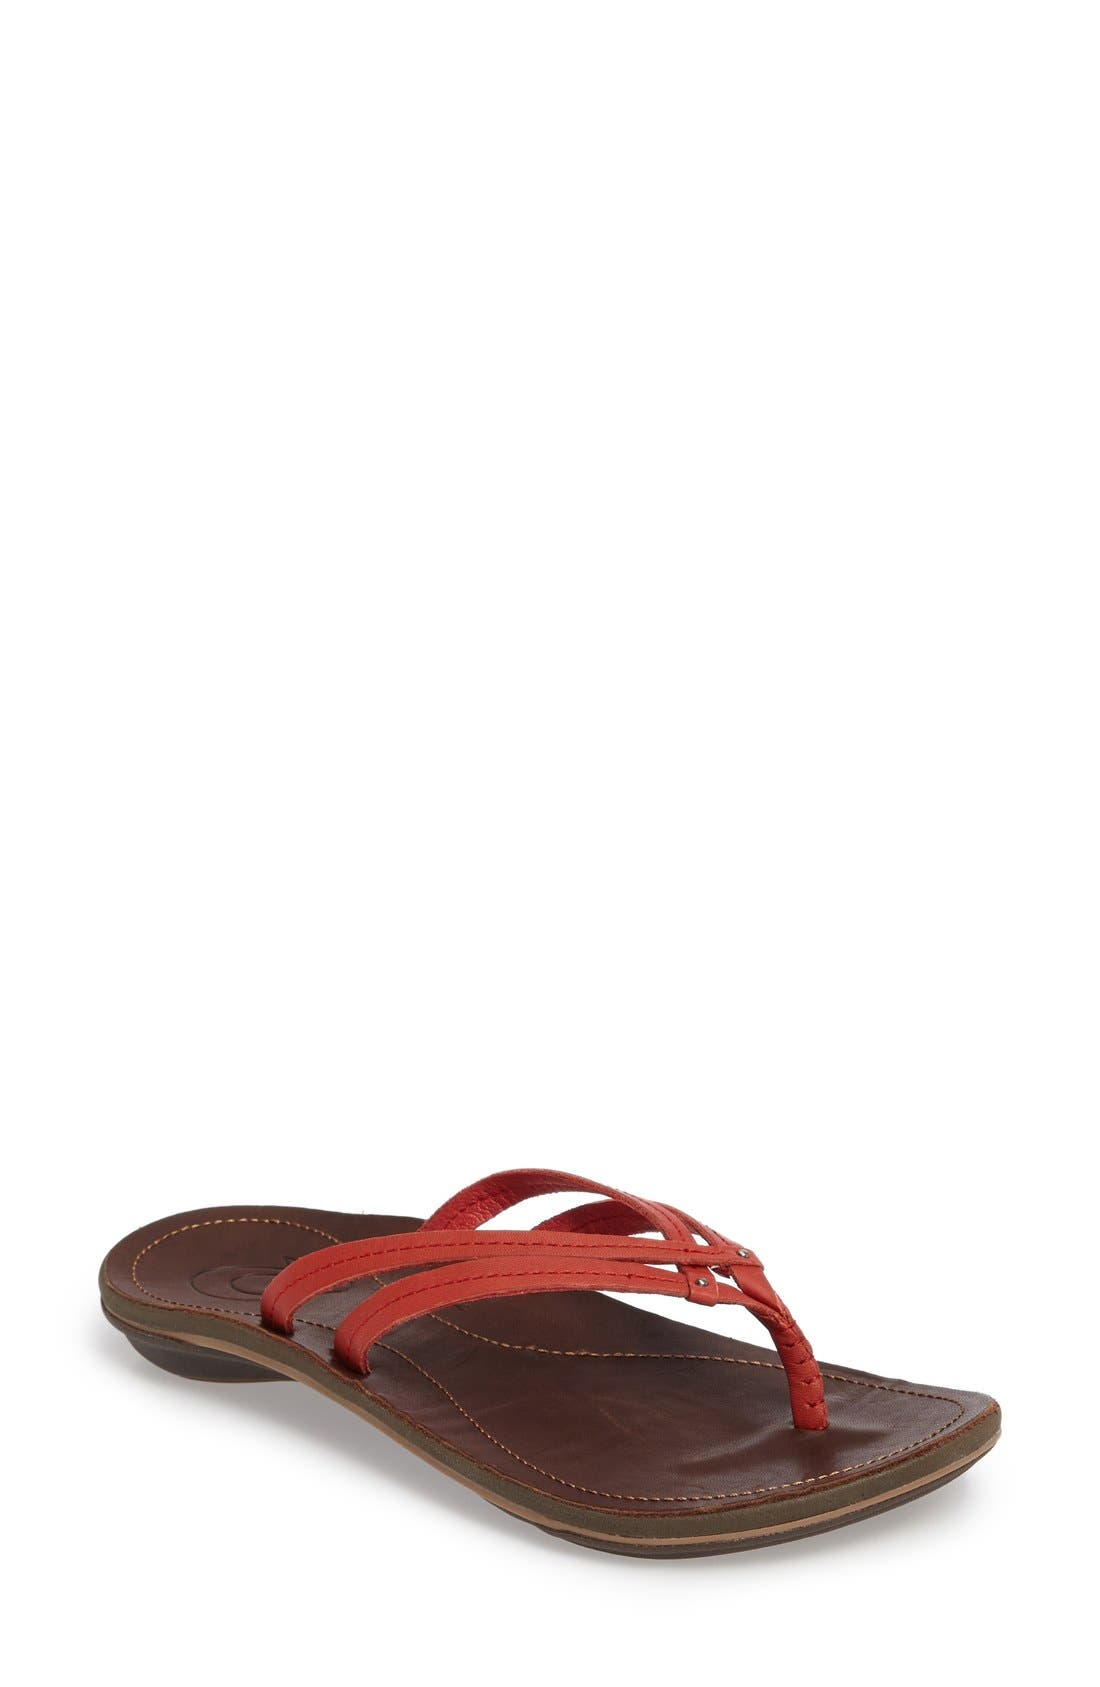 Main Image - OluKai 'U'i' Thong Sandal (Women)